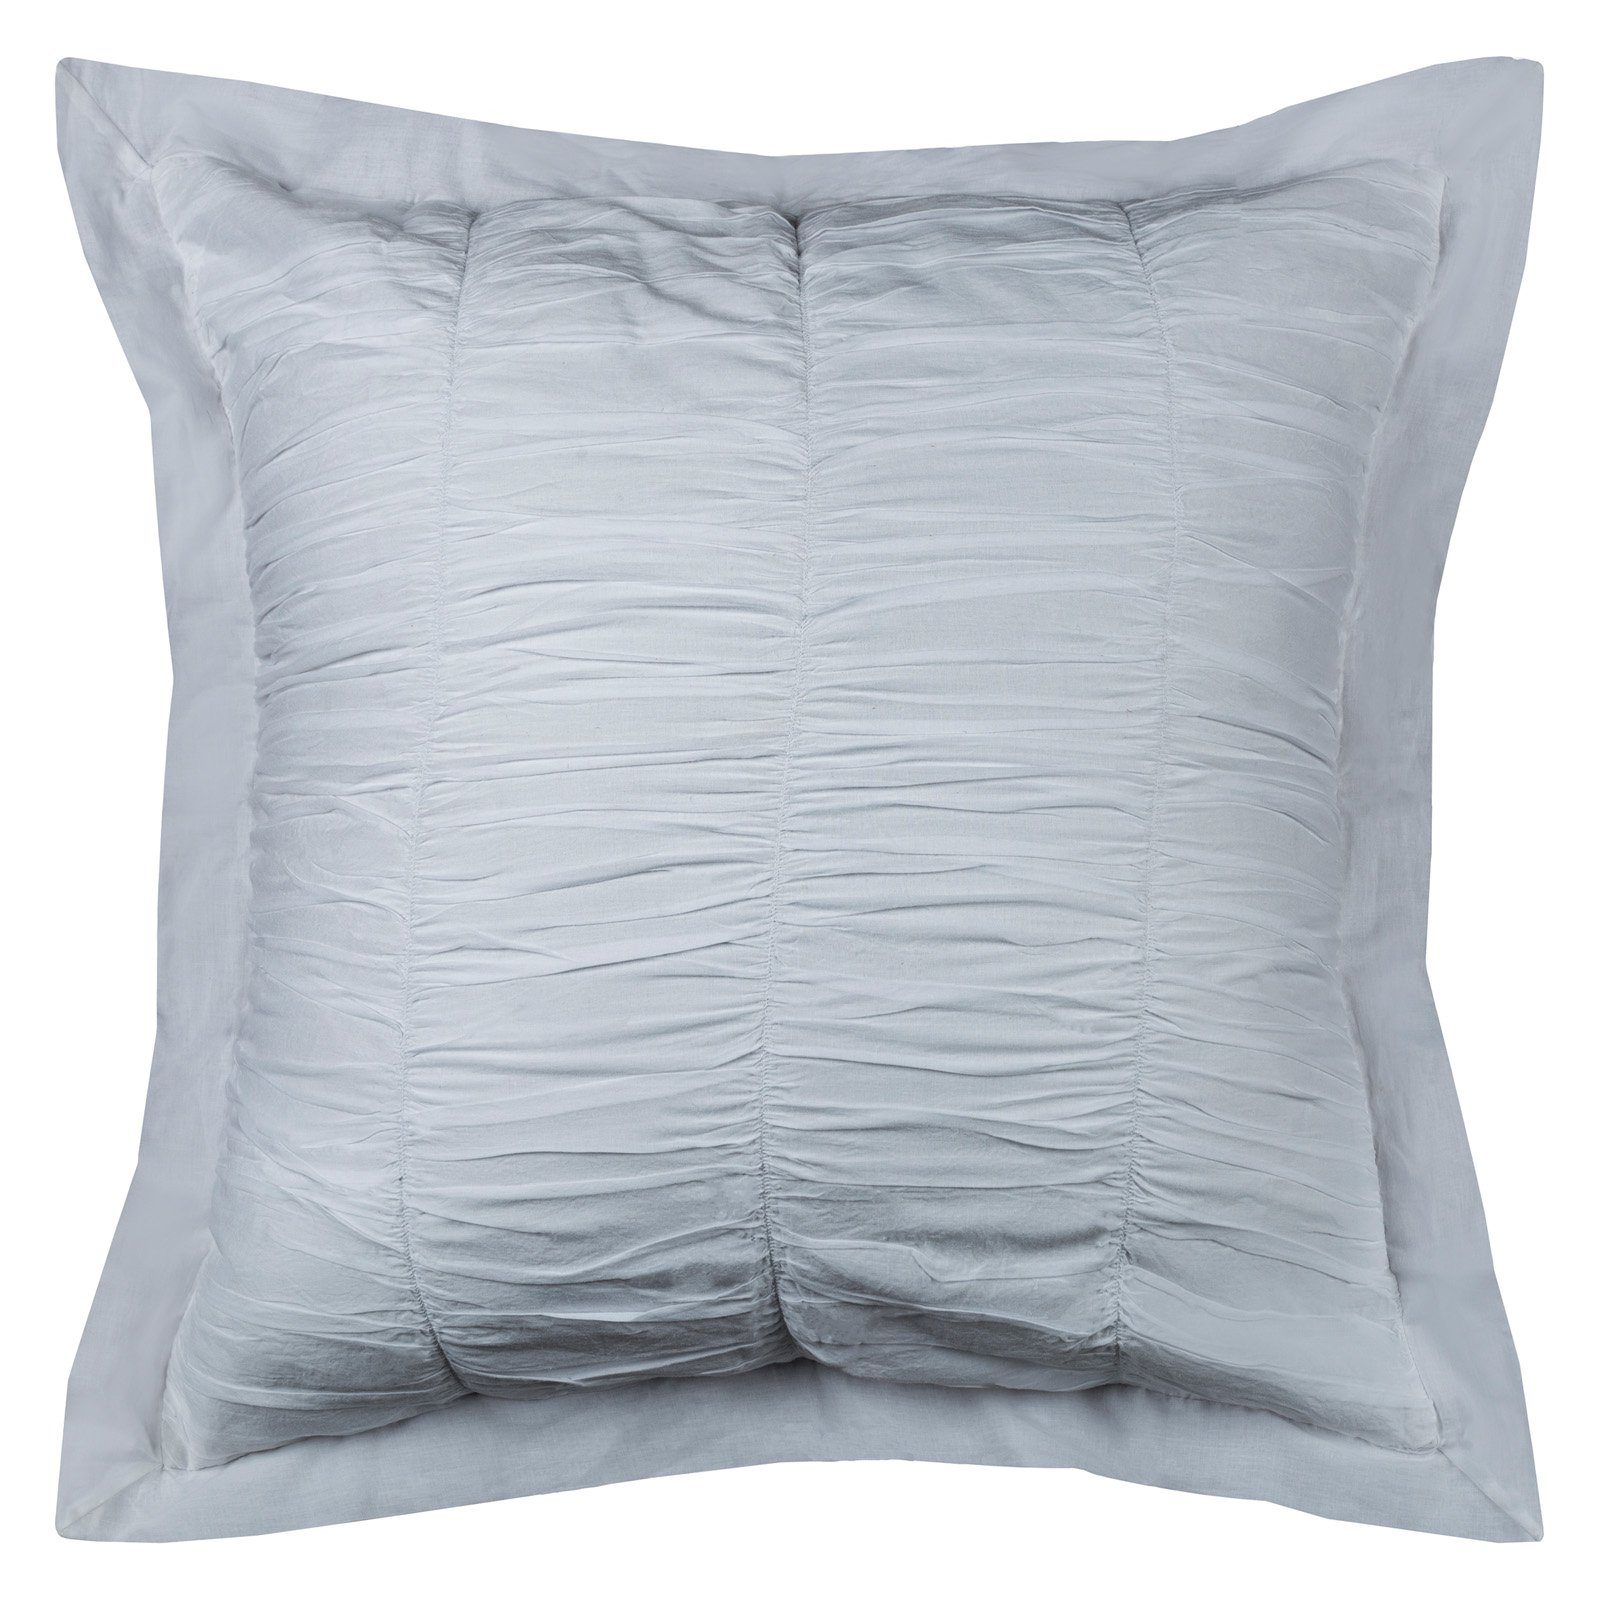 "Rizzy Home Cotton Voile White Euro Sham  26"" X 26"""